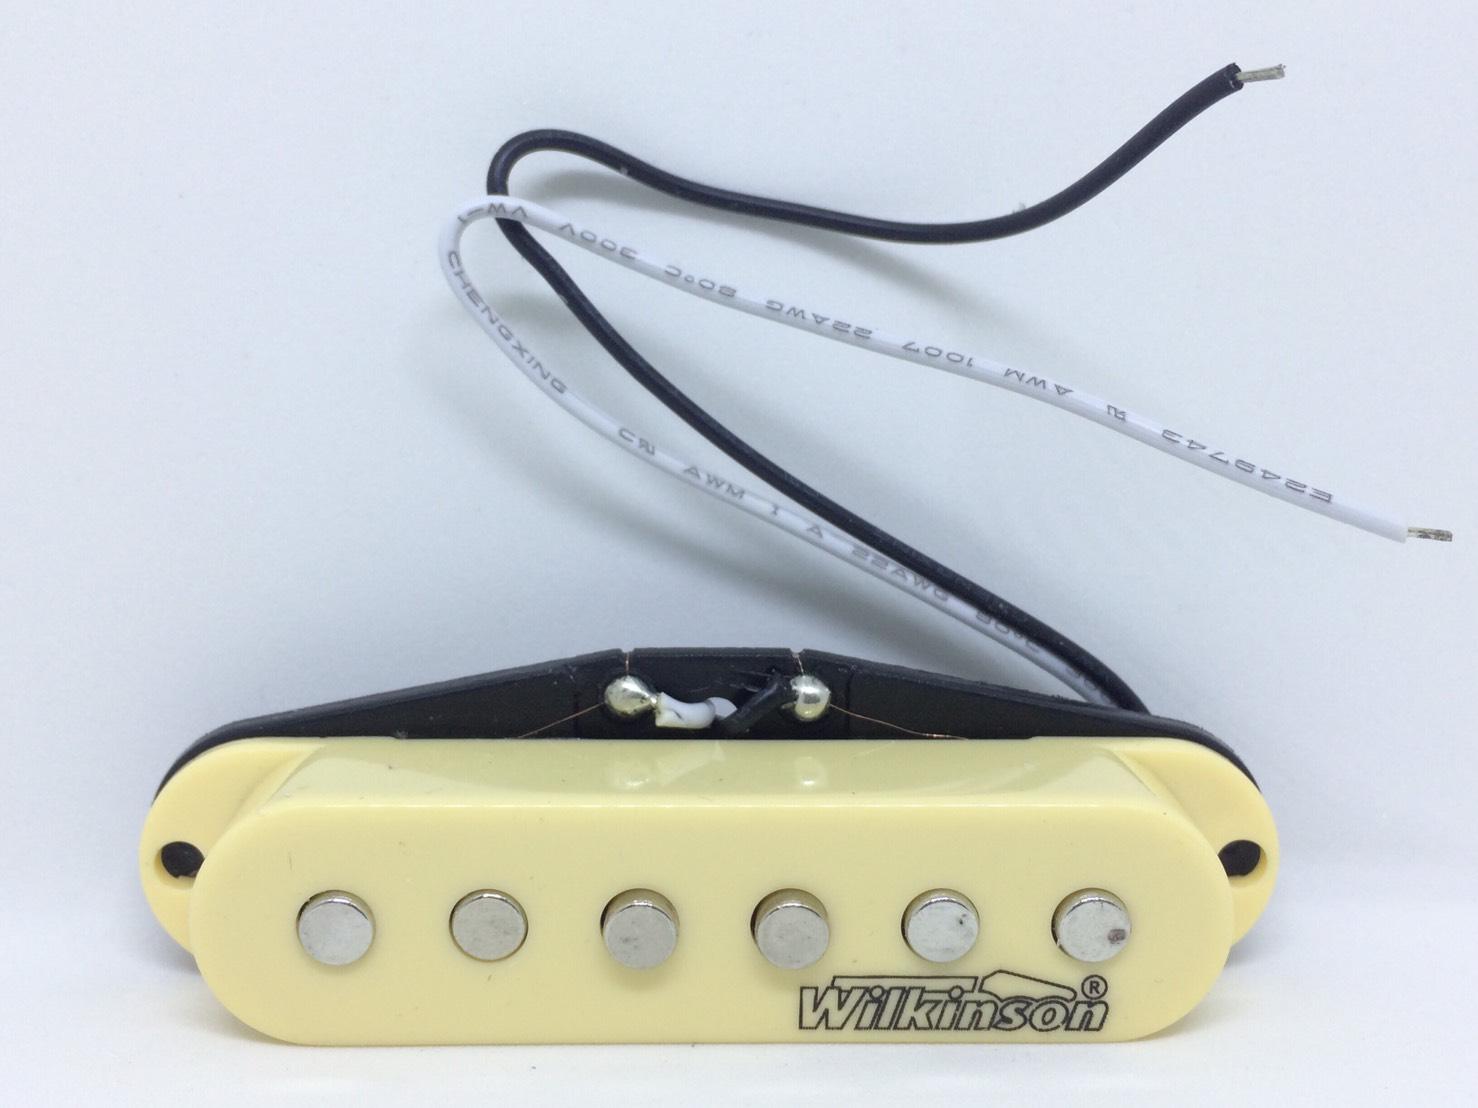 Vintage Voice Single Coil ST Pickups #00511